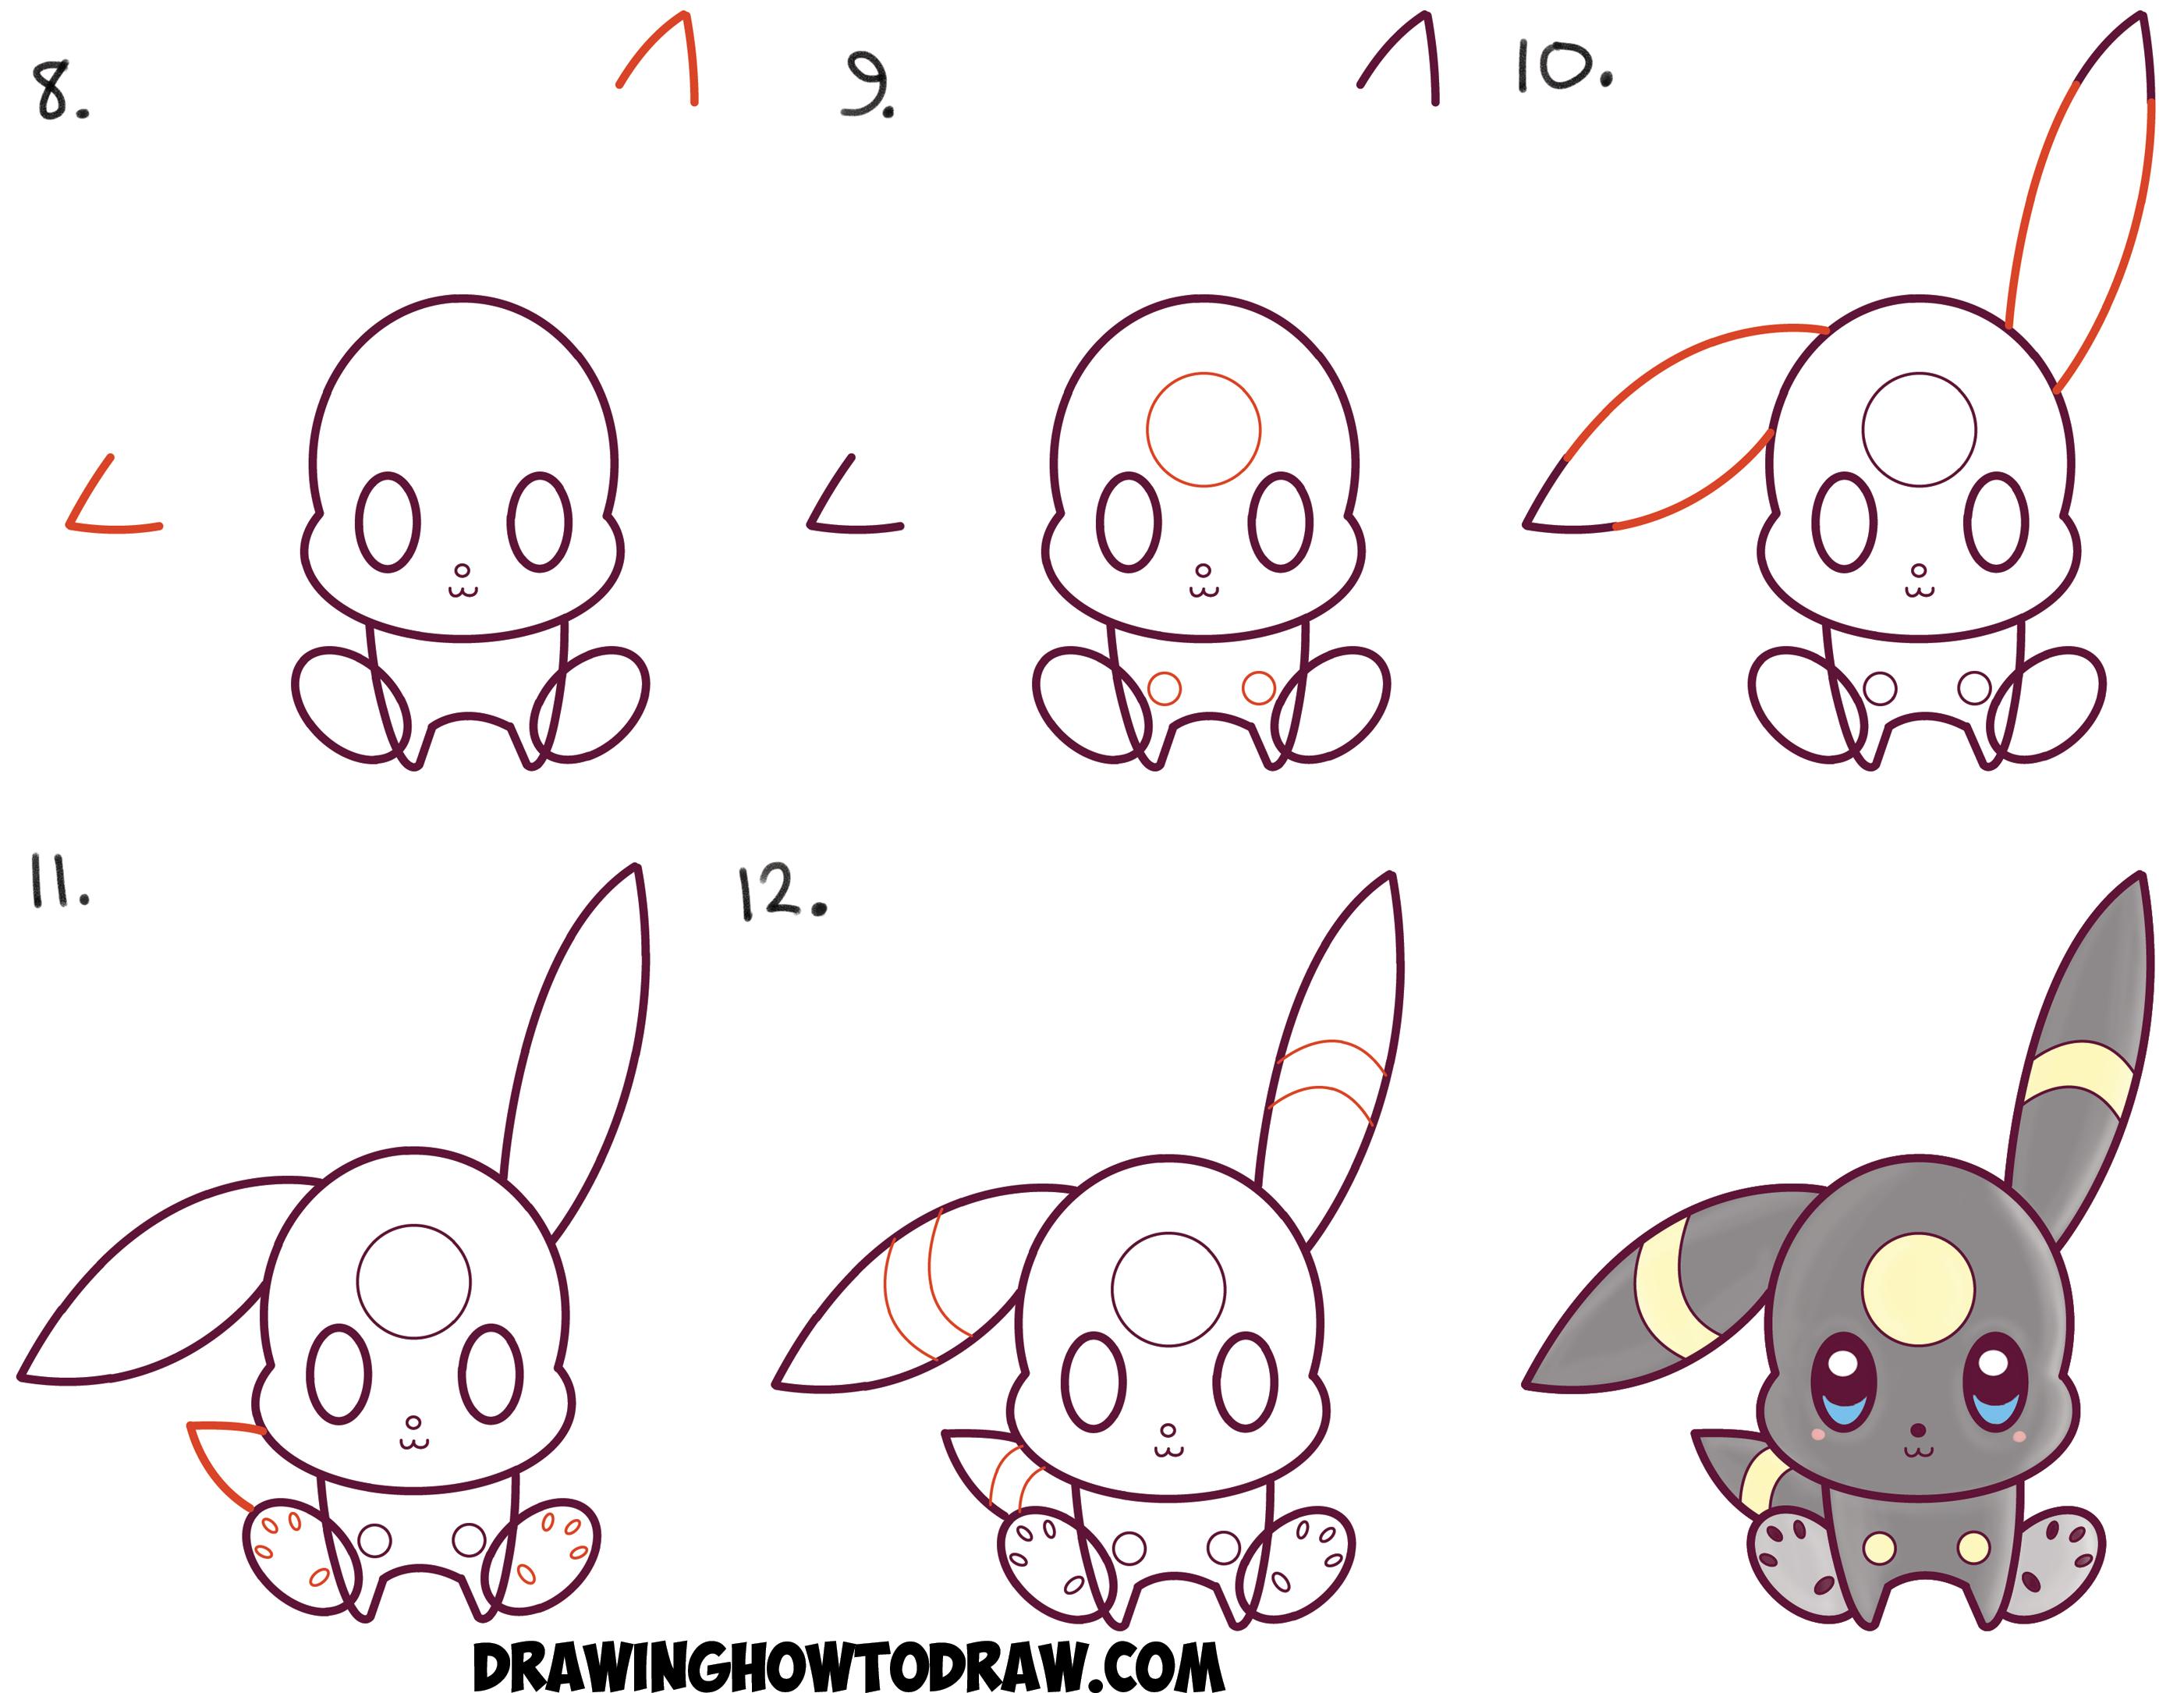 Stepbystep Tutorial How To Draw A Koala Face Jpg 2800x2170 Cute Koala  Face Easy Drawings